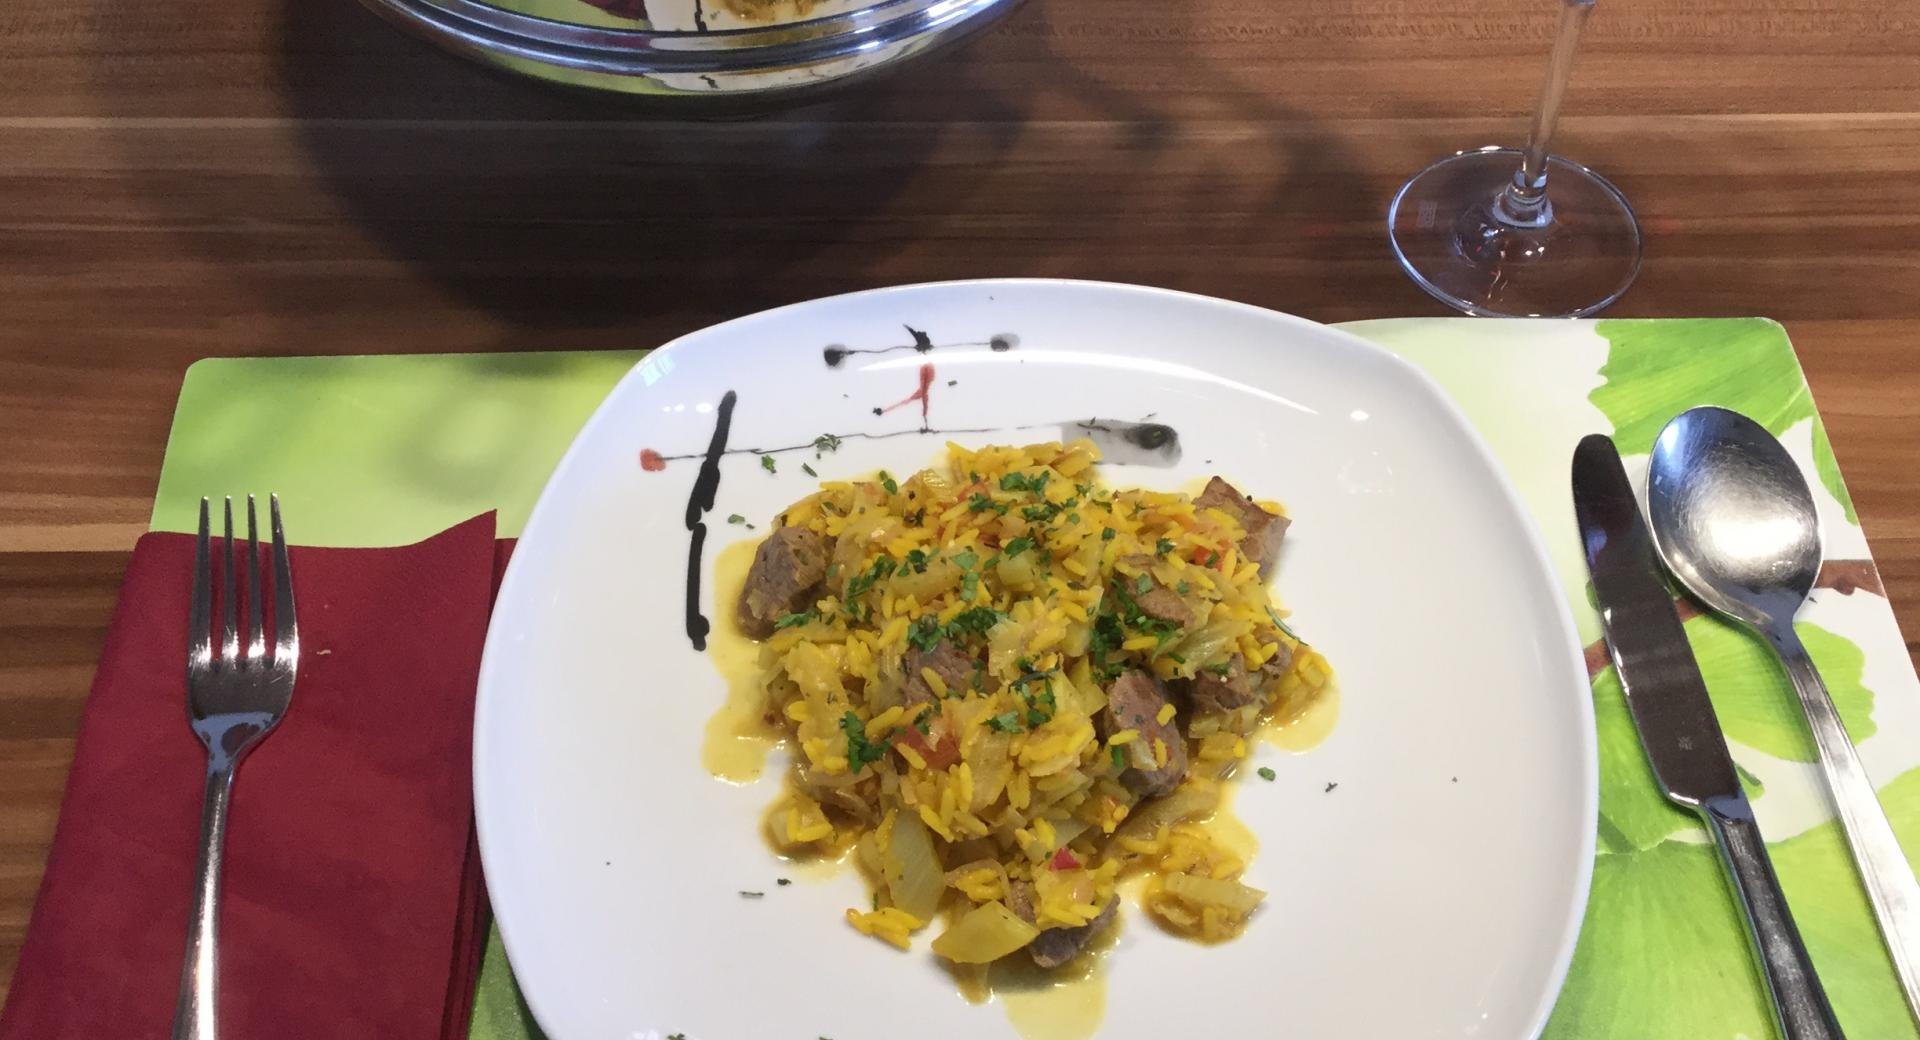 Lamm-Safran-Gemüse-Reis-Eintopf